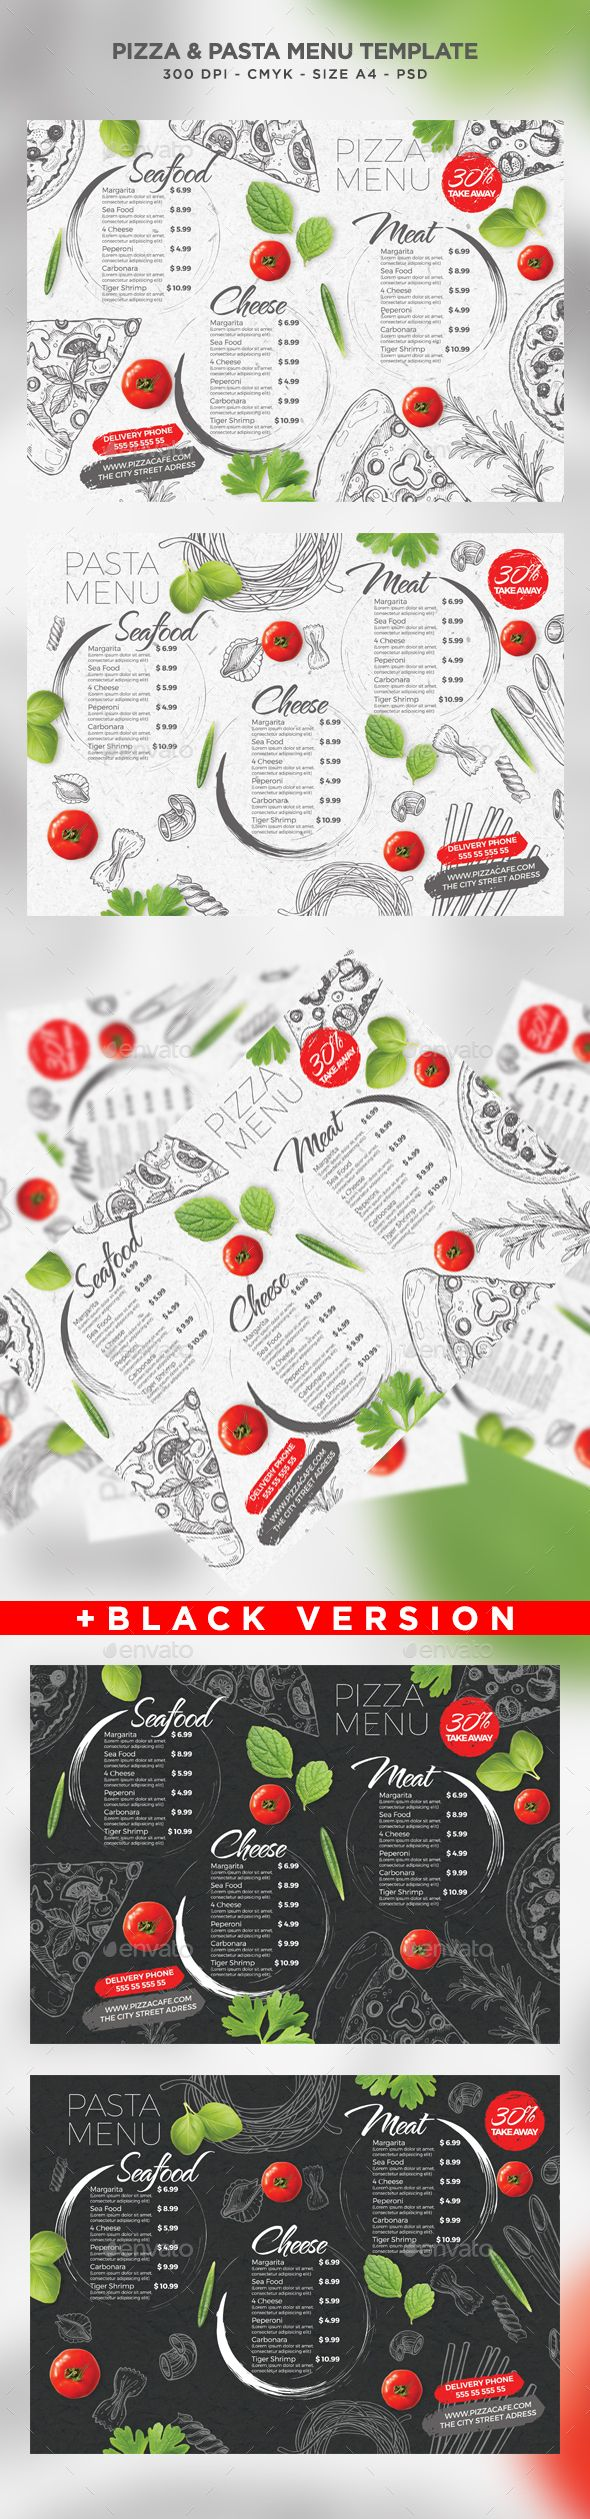 Pizza and Pasta Menu - Food Menus Print Templates Download here : https://graphicriver.net/item/pizza-and-pasta-menu/19615924?s_rank=34&ref=Al-fatih